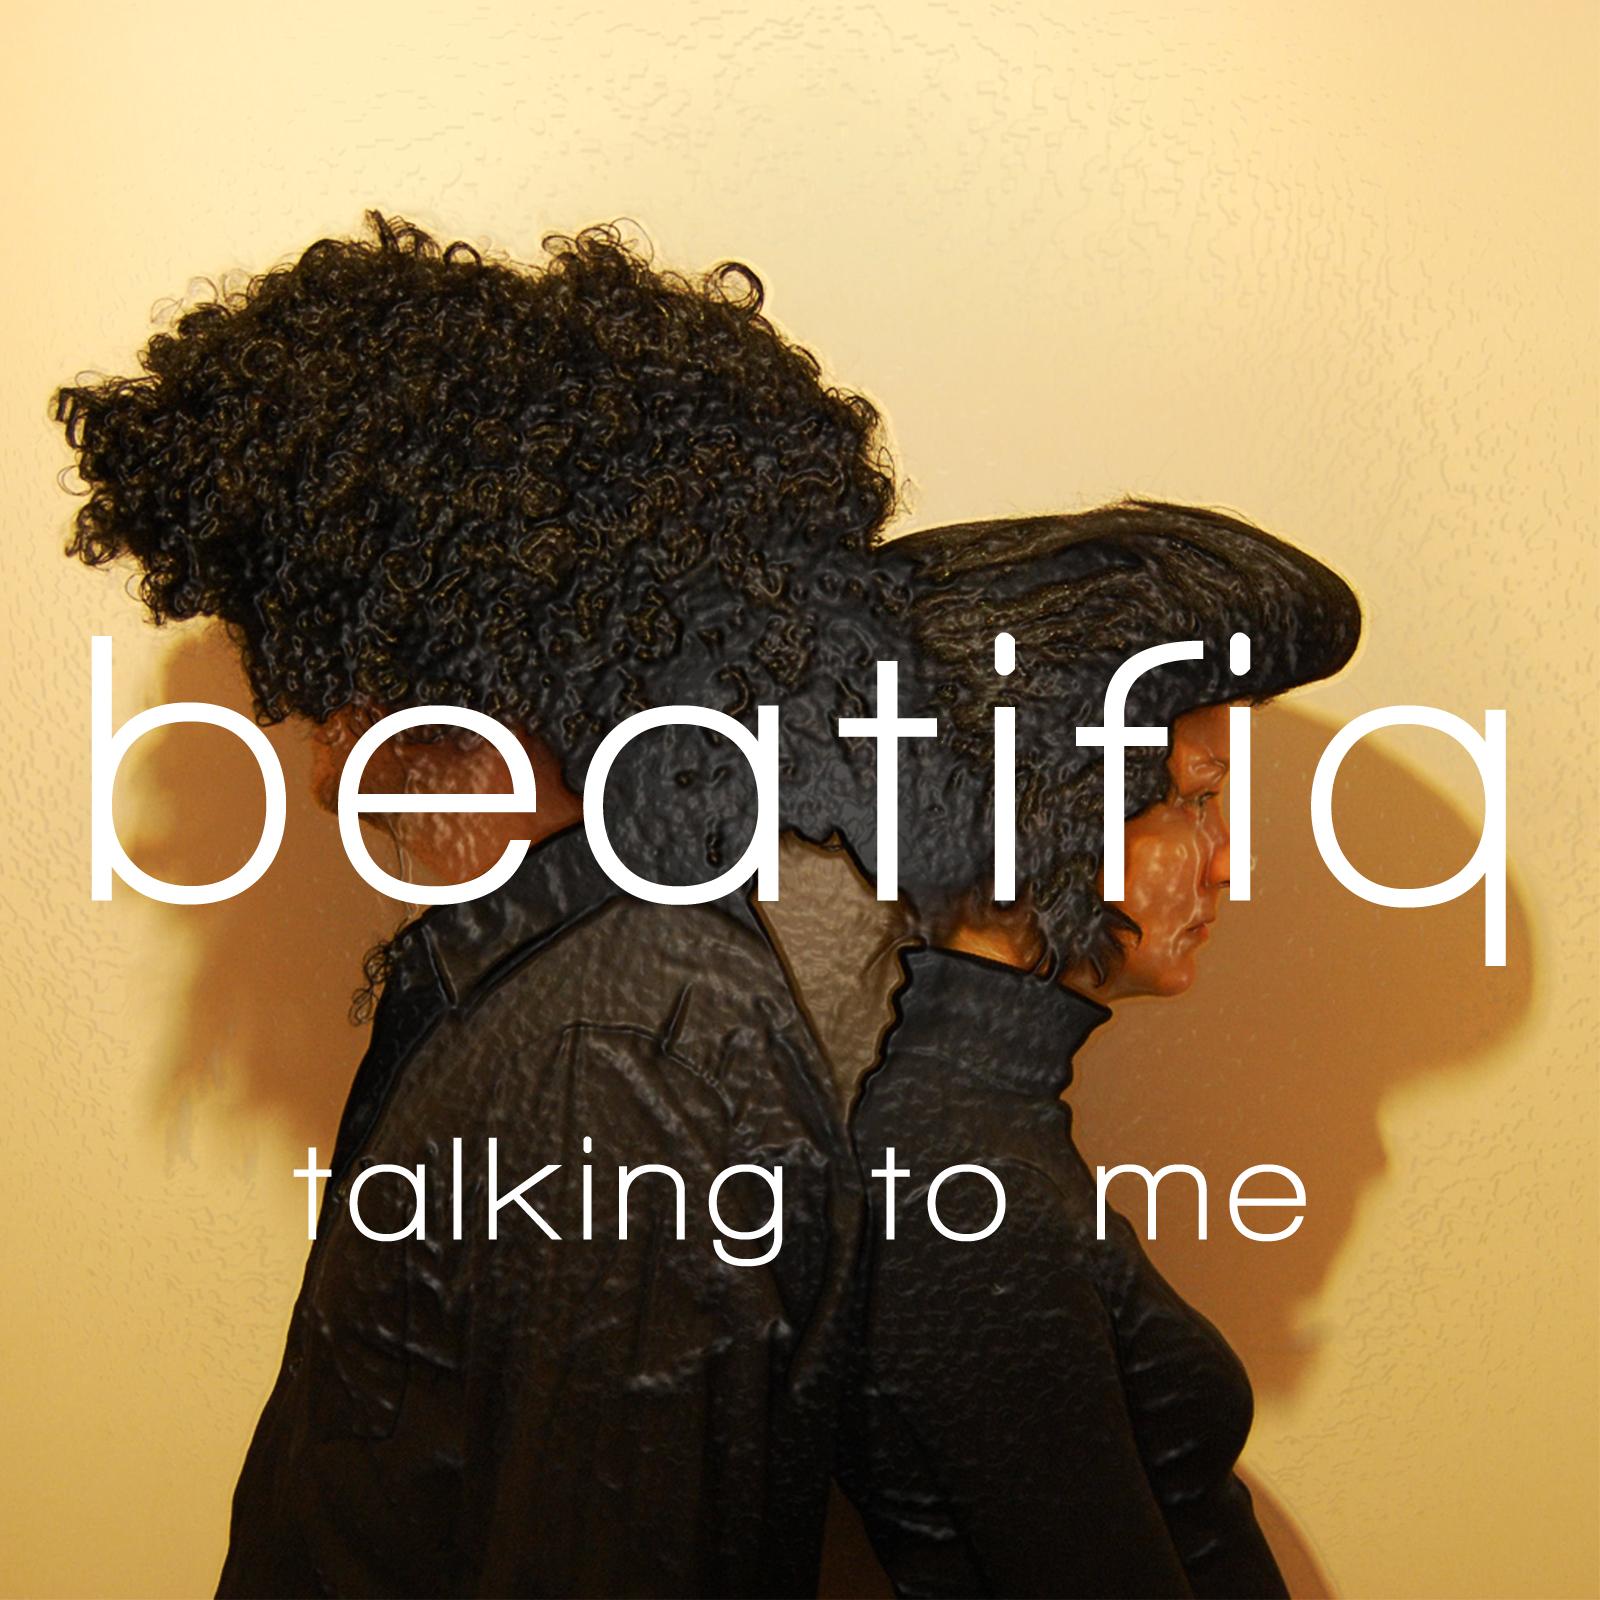 beatifiq talking to me